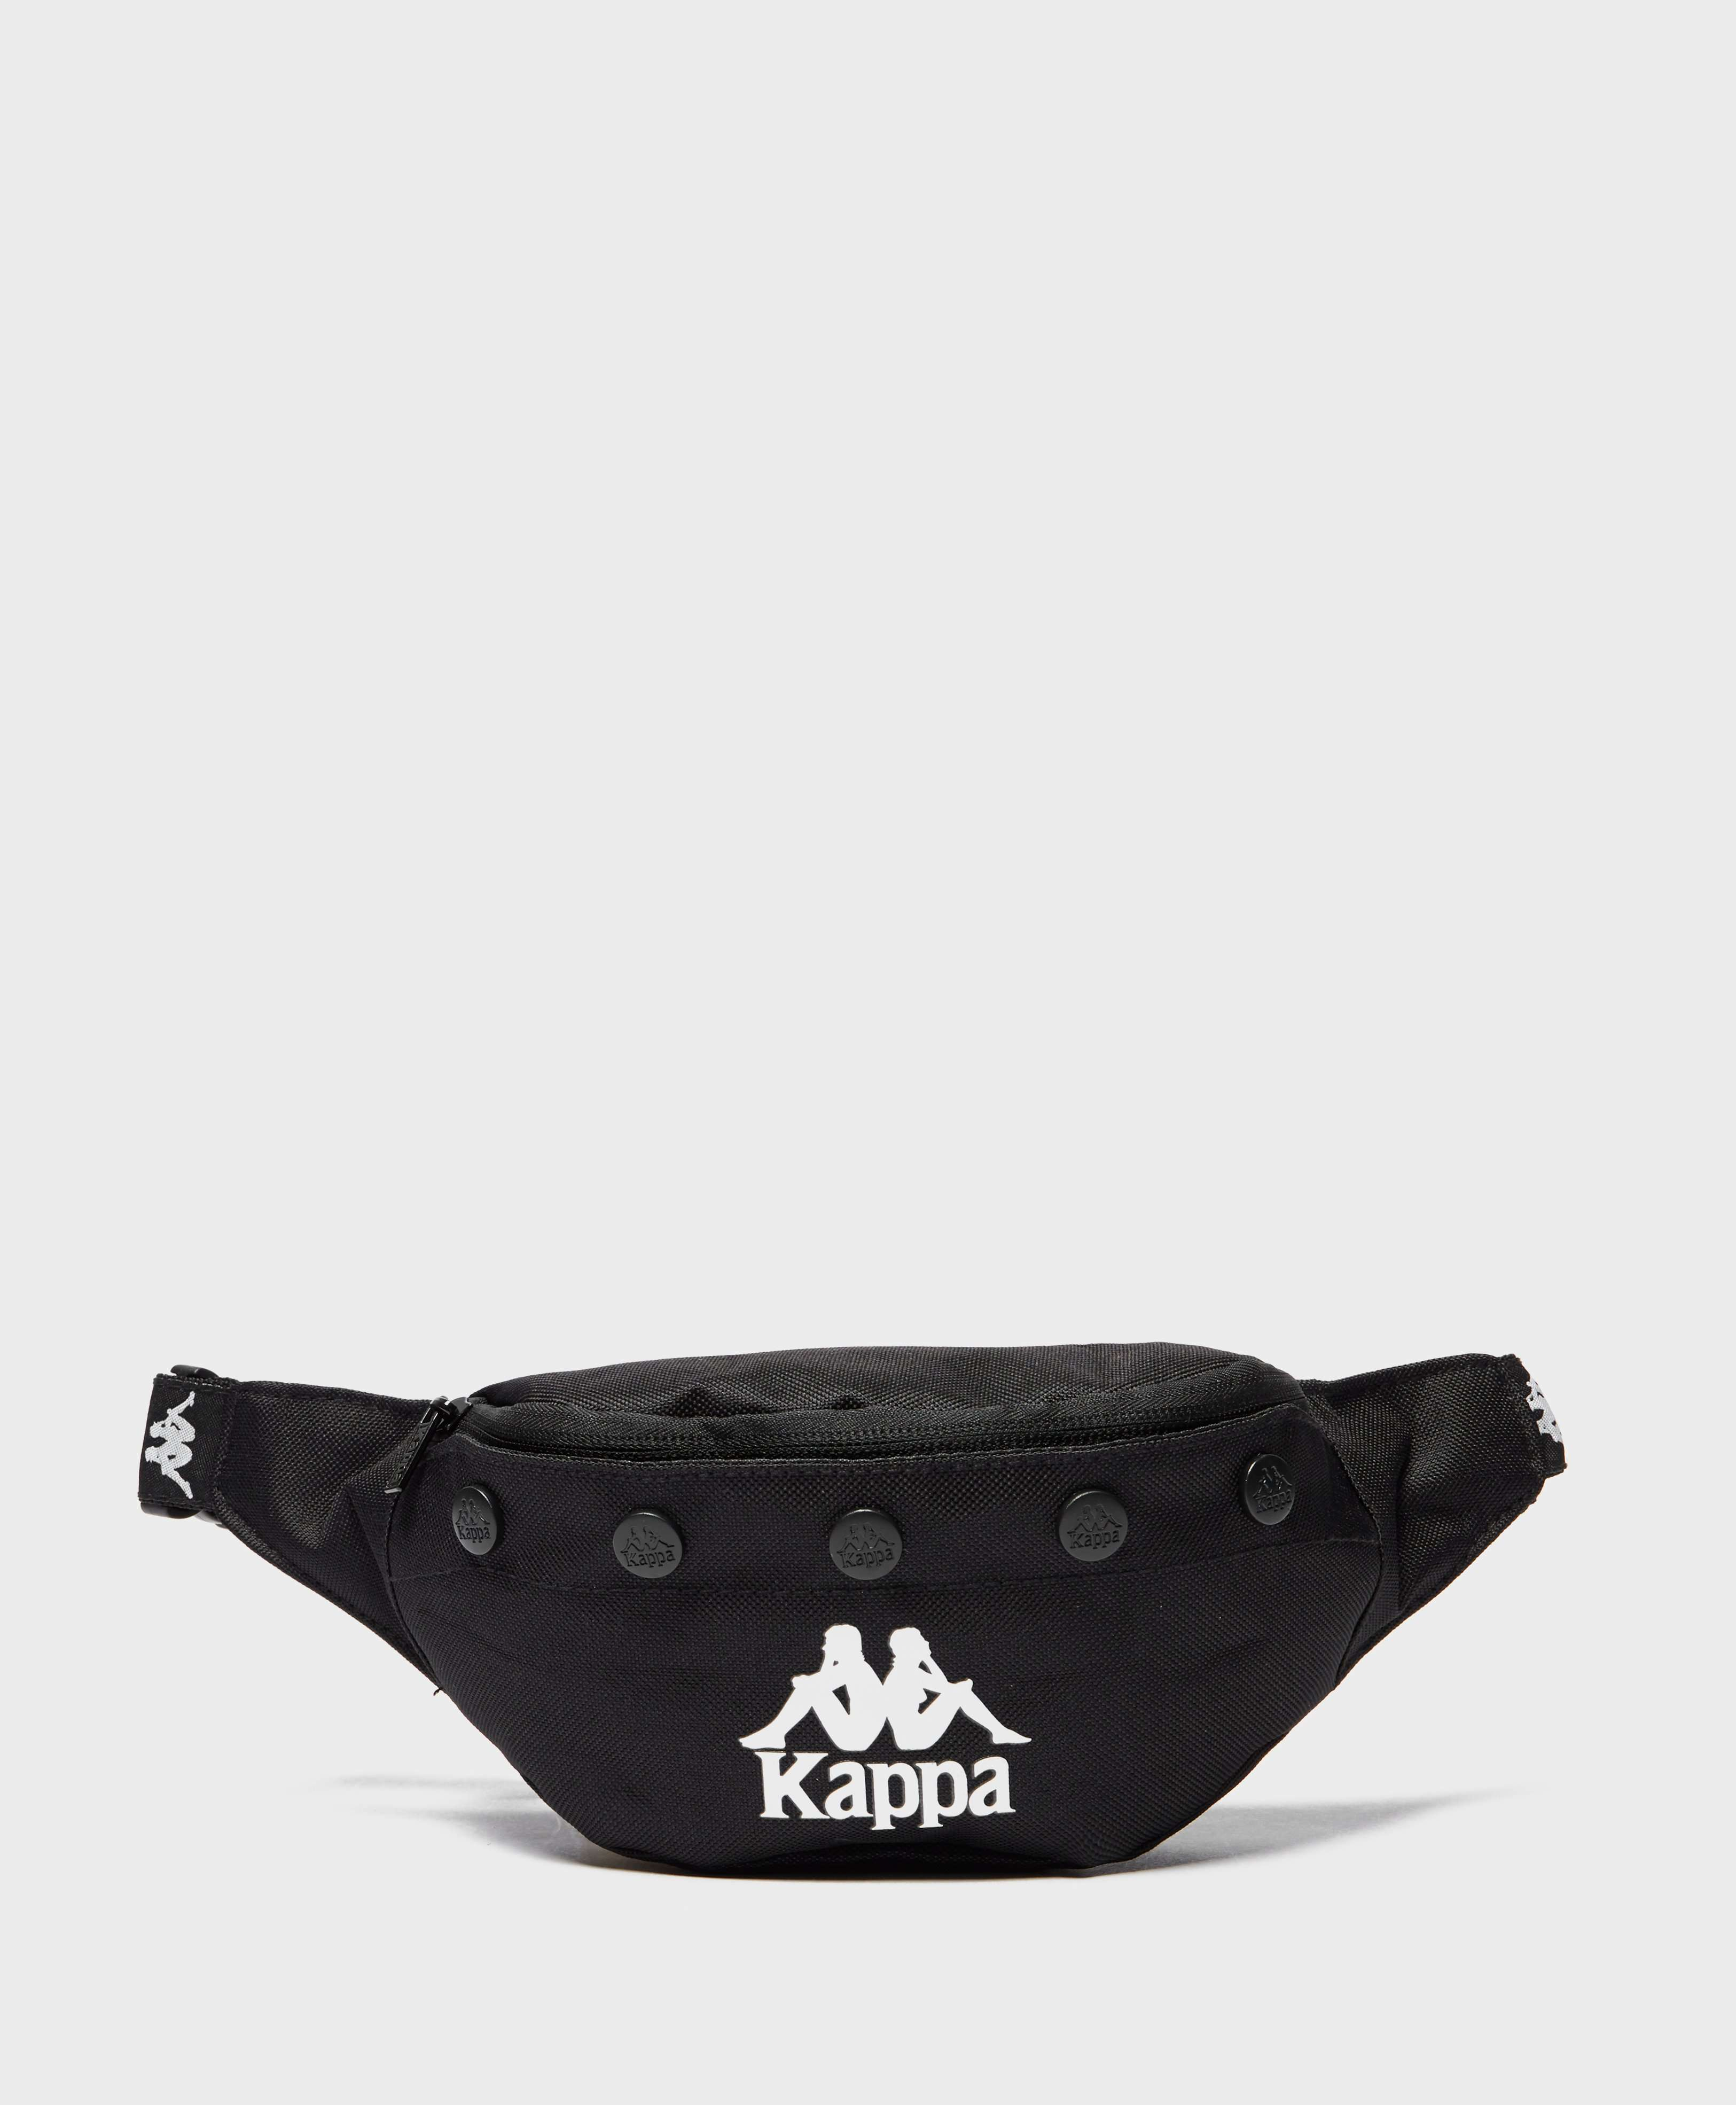 Kappa Pop Button Mesh Bum Bag